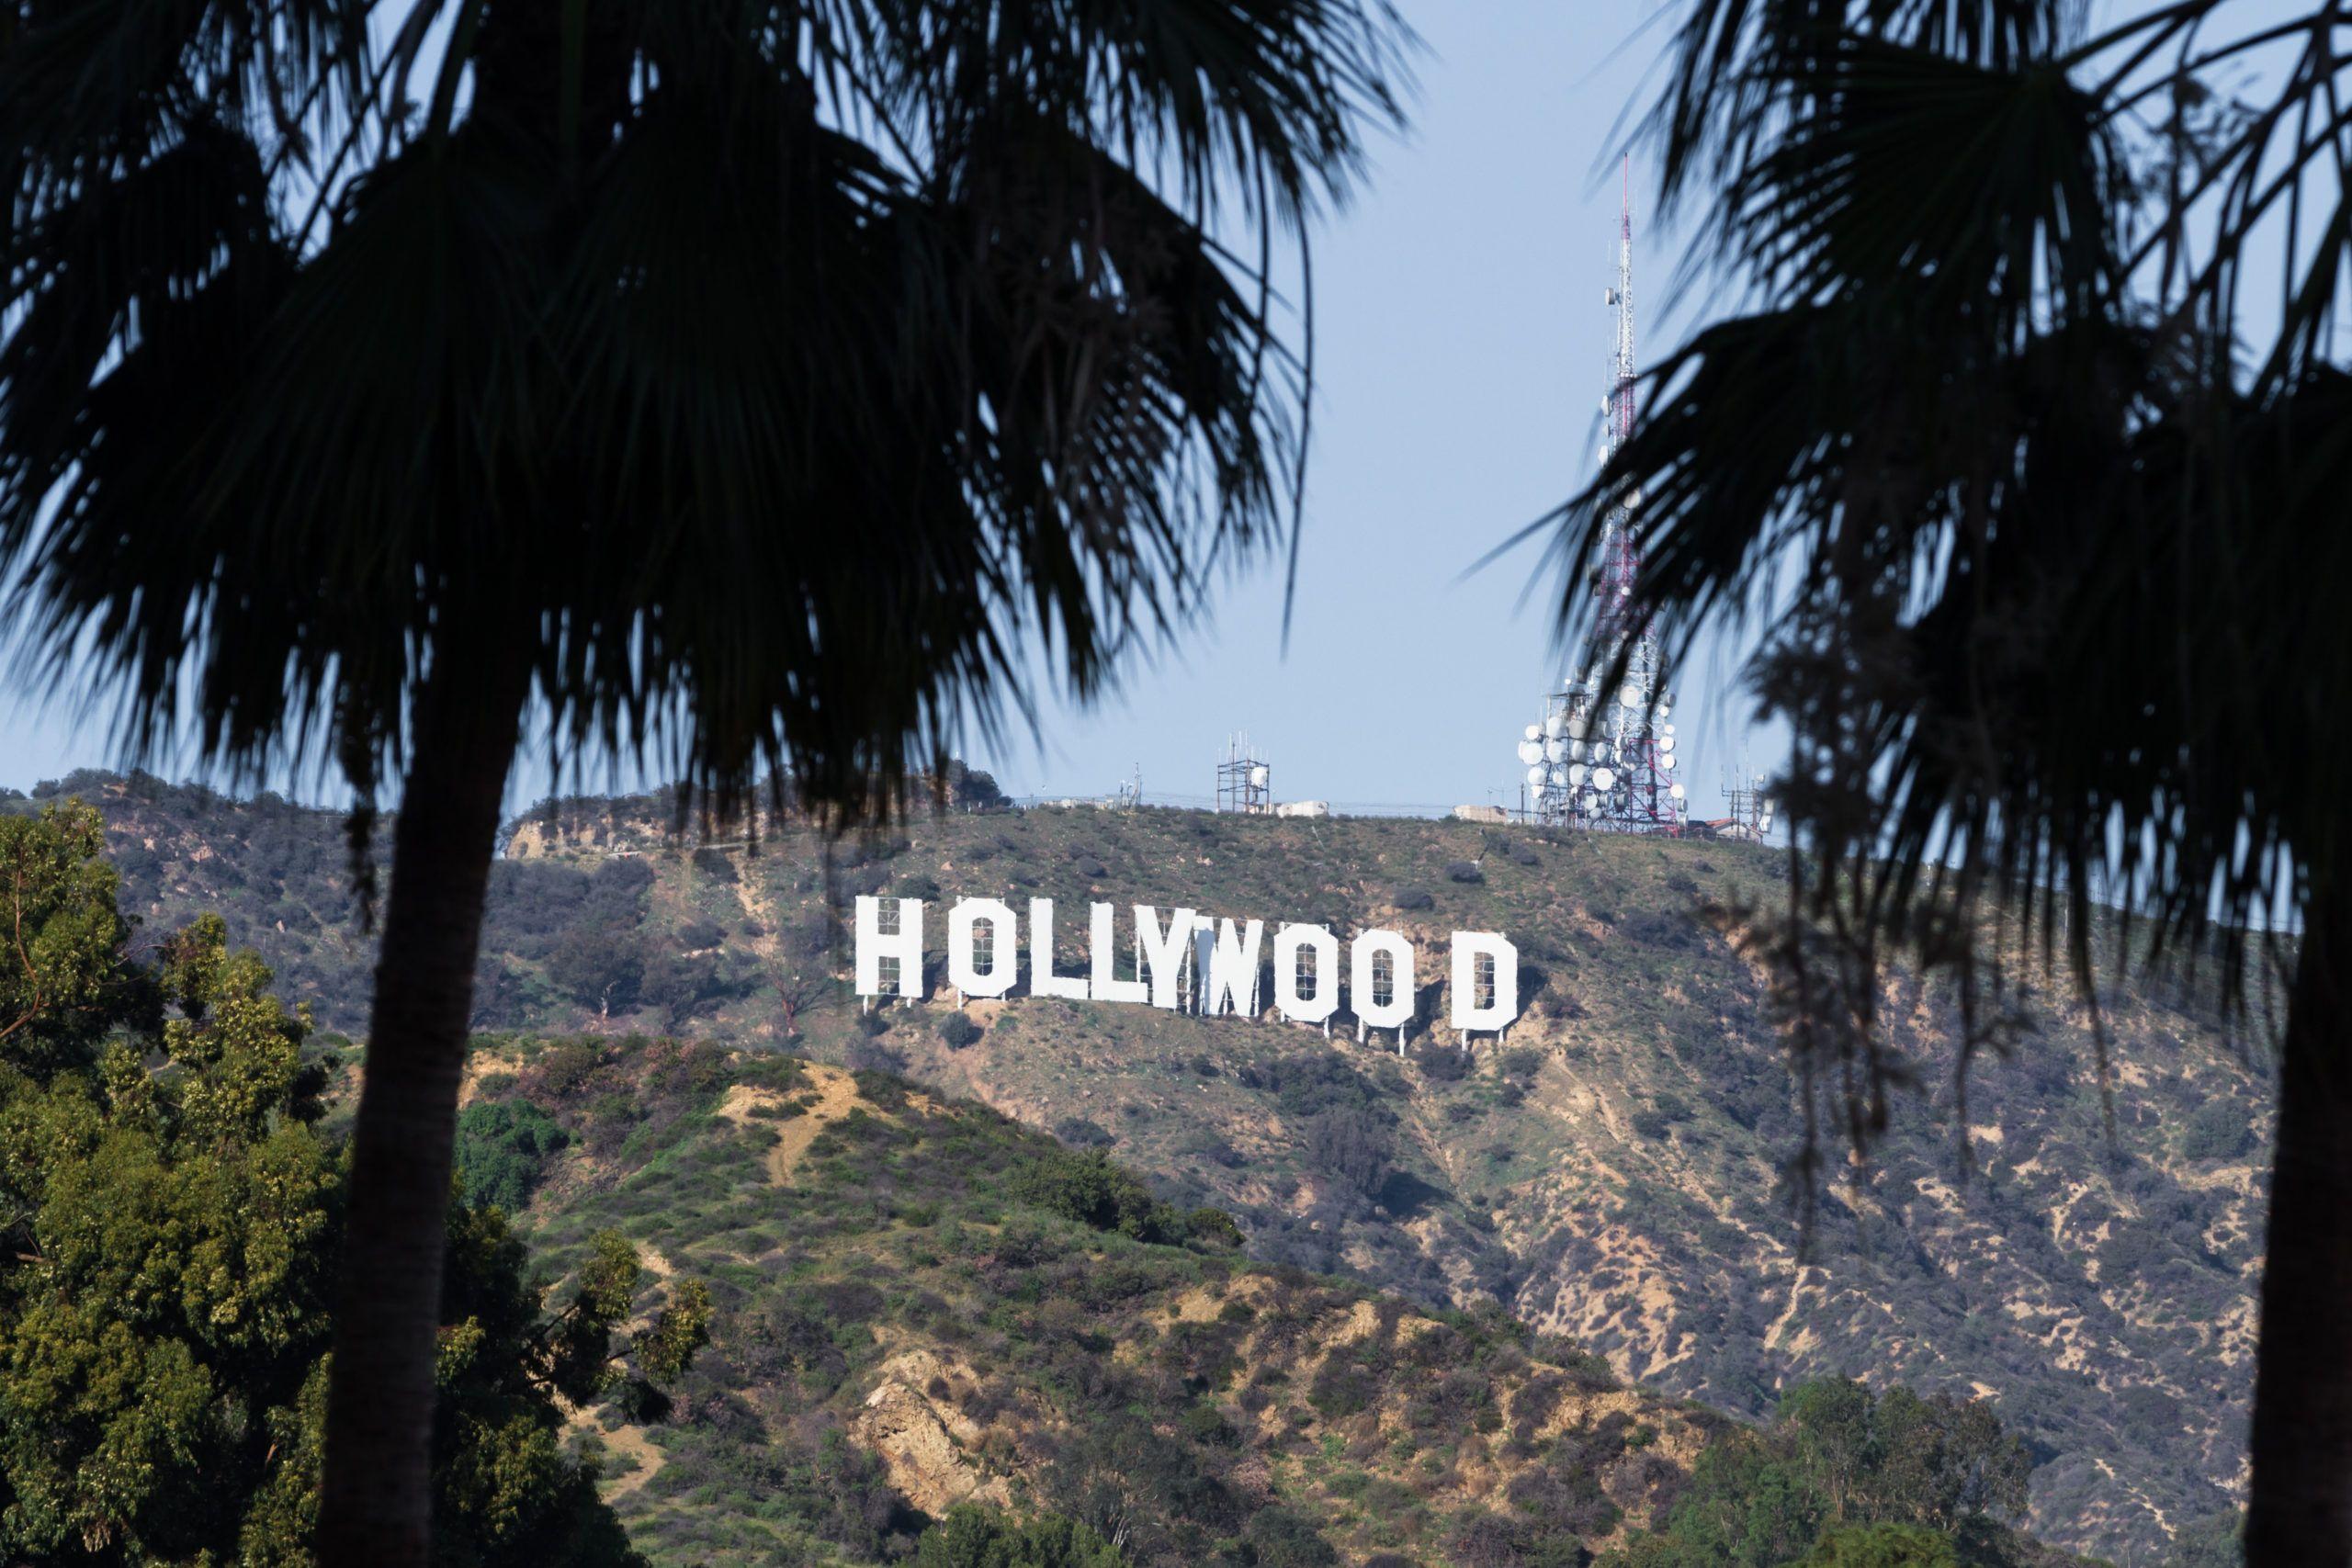 Los Angeles marijuana, Los Angeles reaches marijuana licensing deal for current applicants